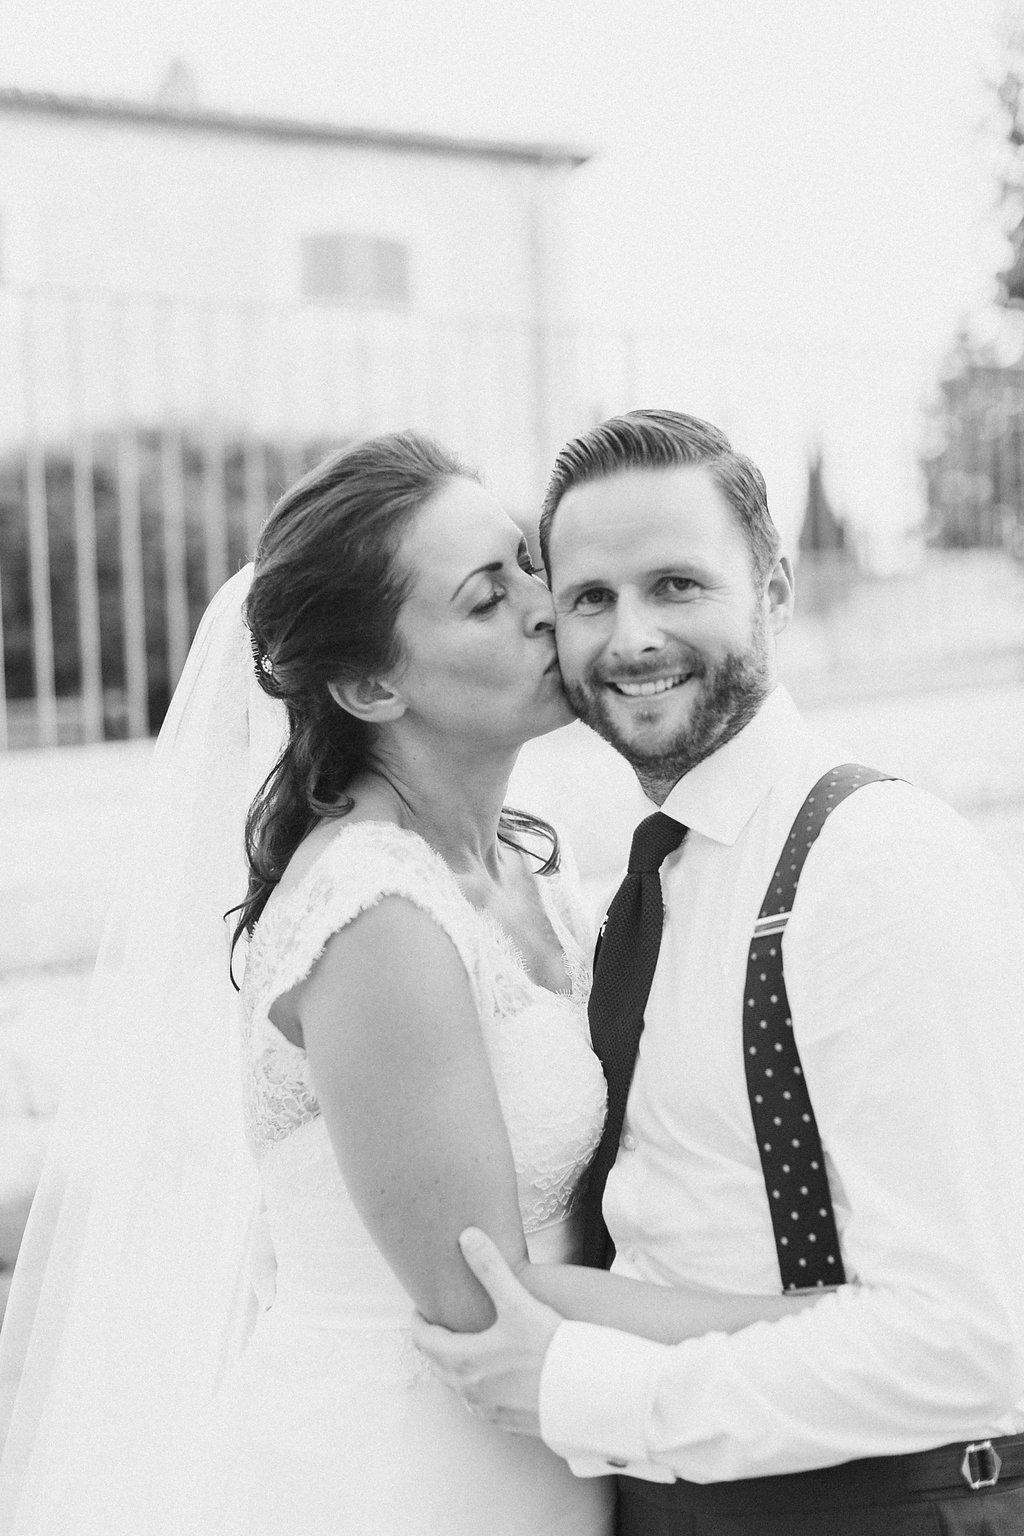 castelfalfi-tuscany-wedding-photographer-roberta-facchini-368